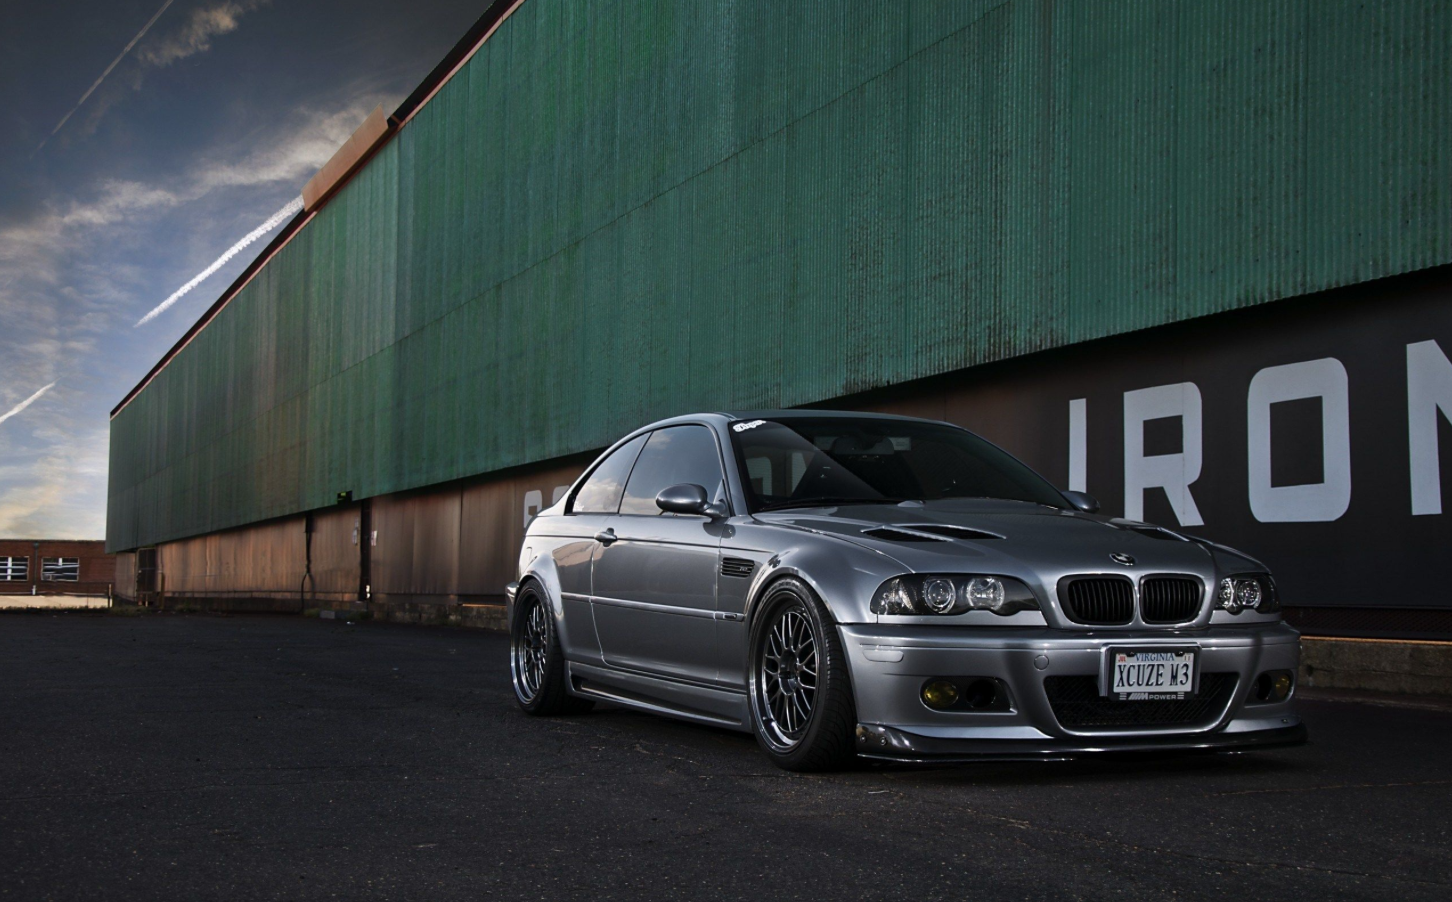 Spare's BMW